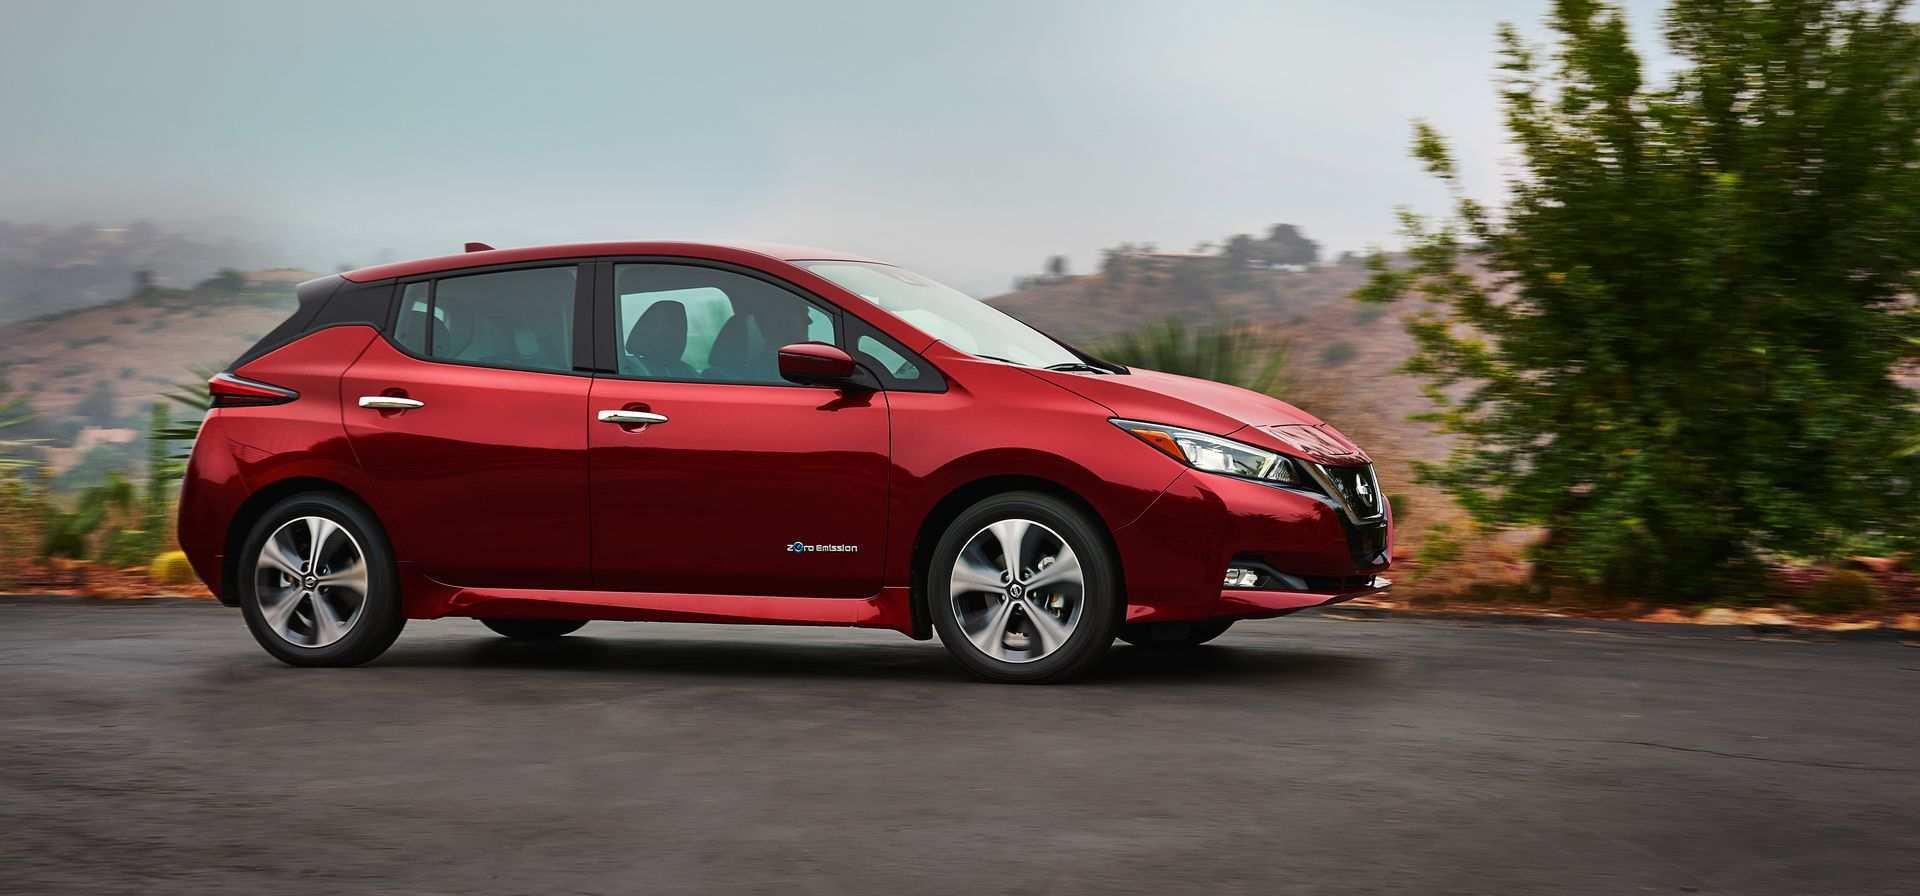 49 Best Review Nissan Leaf 2020 Uk New Review for Nissan Leaf 2020 Uk